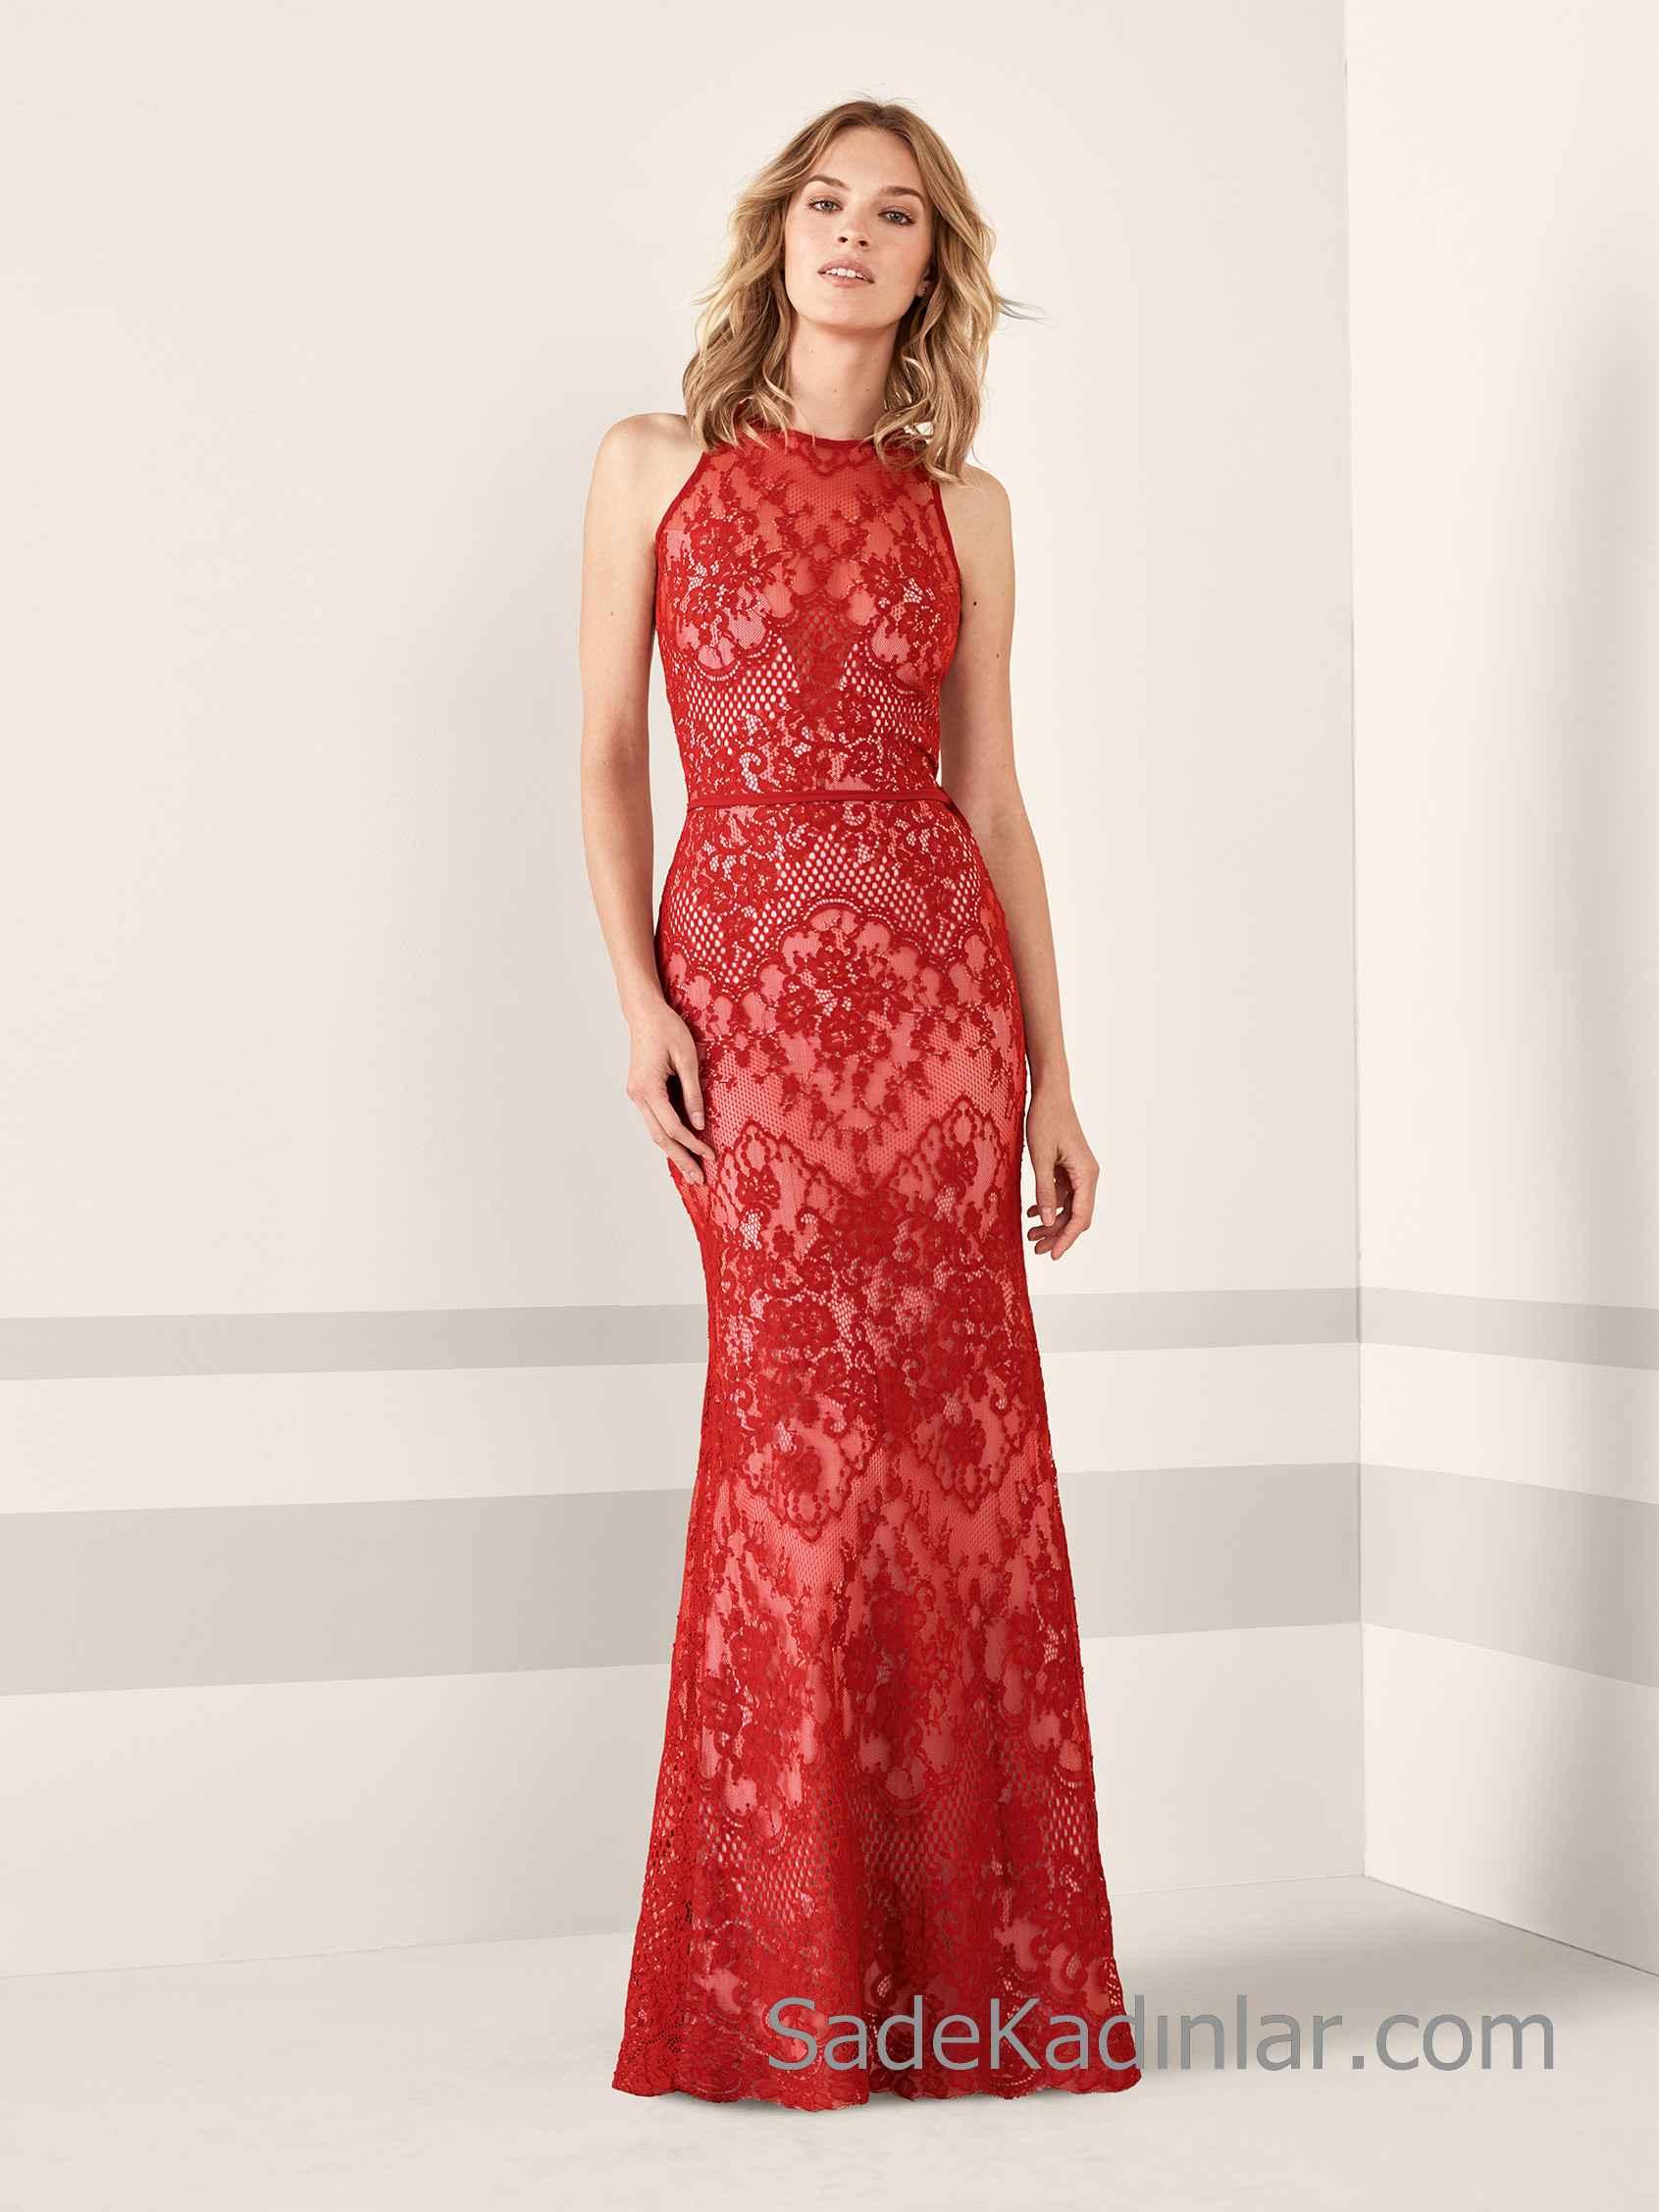 Renkli Dantelli Elbise Modelleri 2019